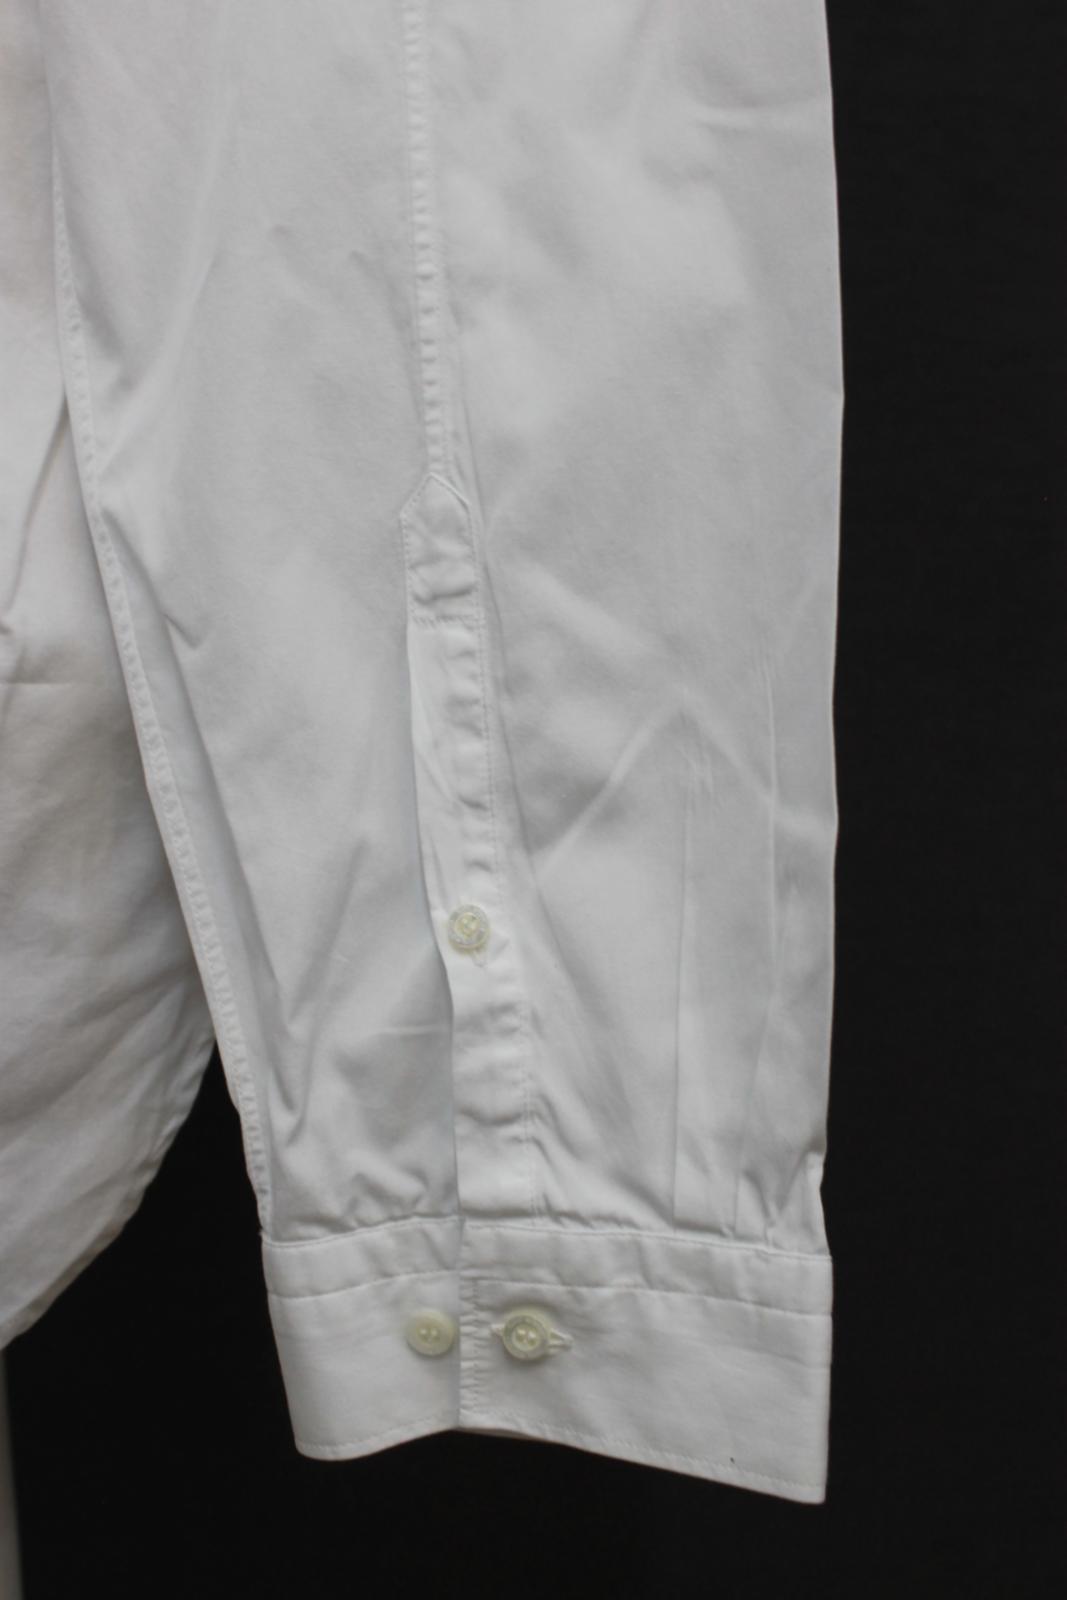 Neil-barrett-hombre-blanco-de-algodon-manga-de-Rayo-con-cuello-camisa-tamano-17-5-034 miniatura 8